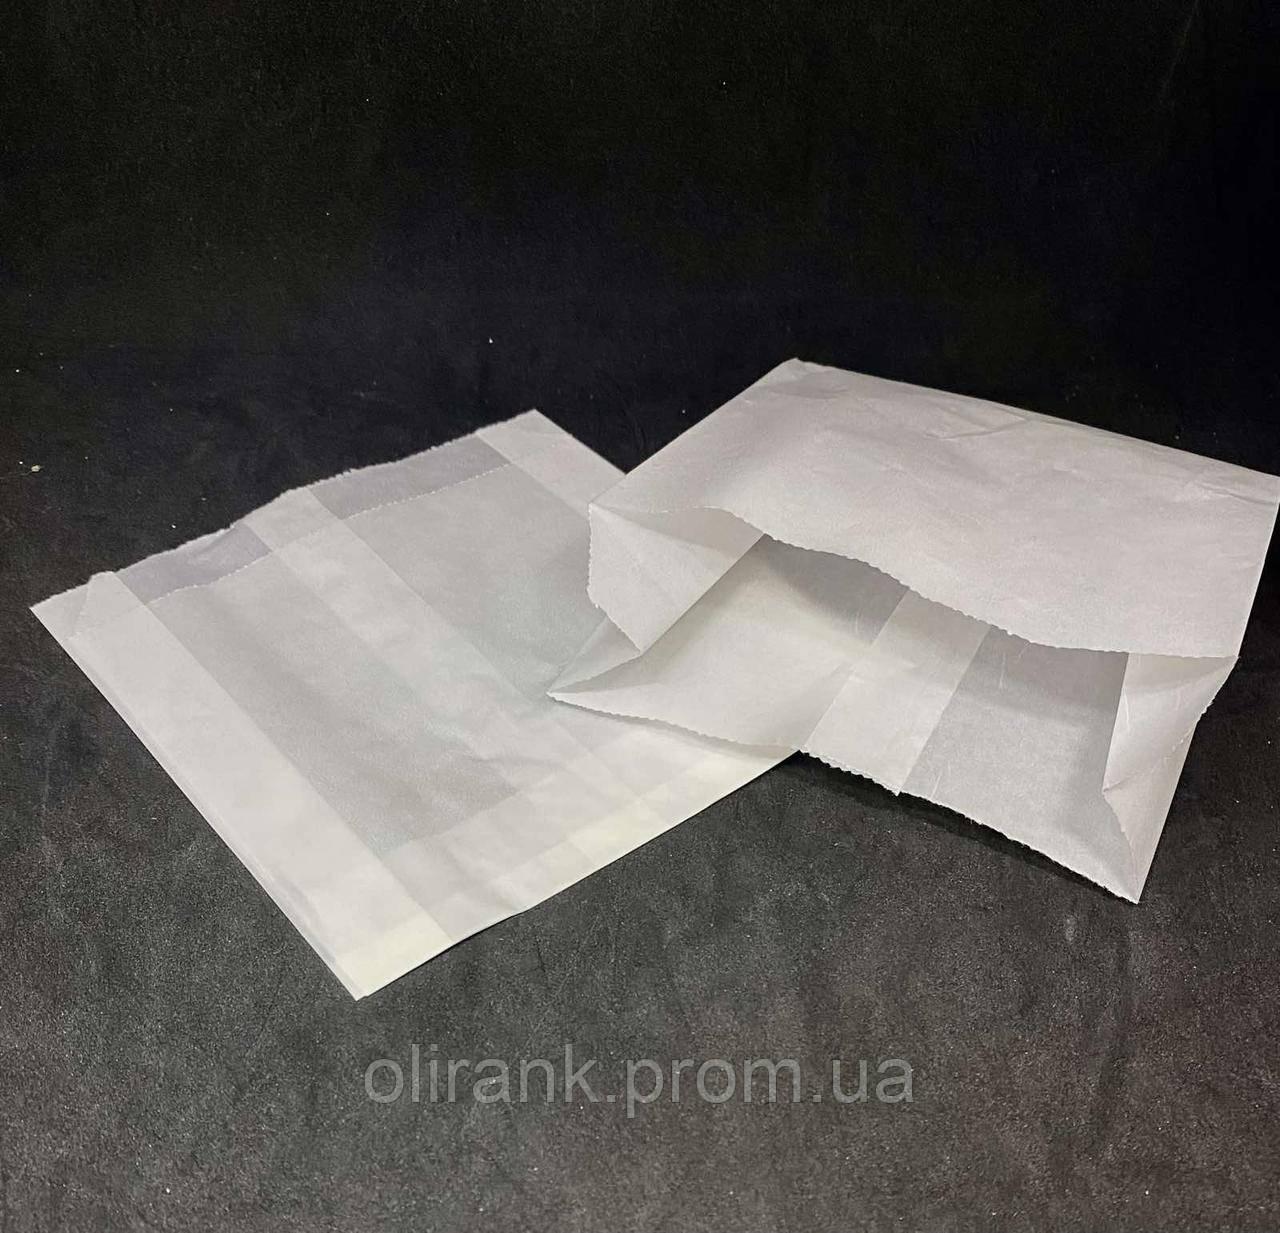 Пакет паперовий для ФРІ 120*50*150 (1000шт/уп)